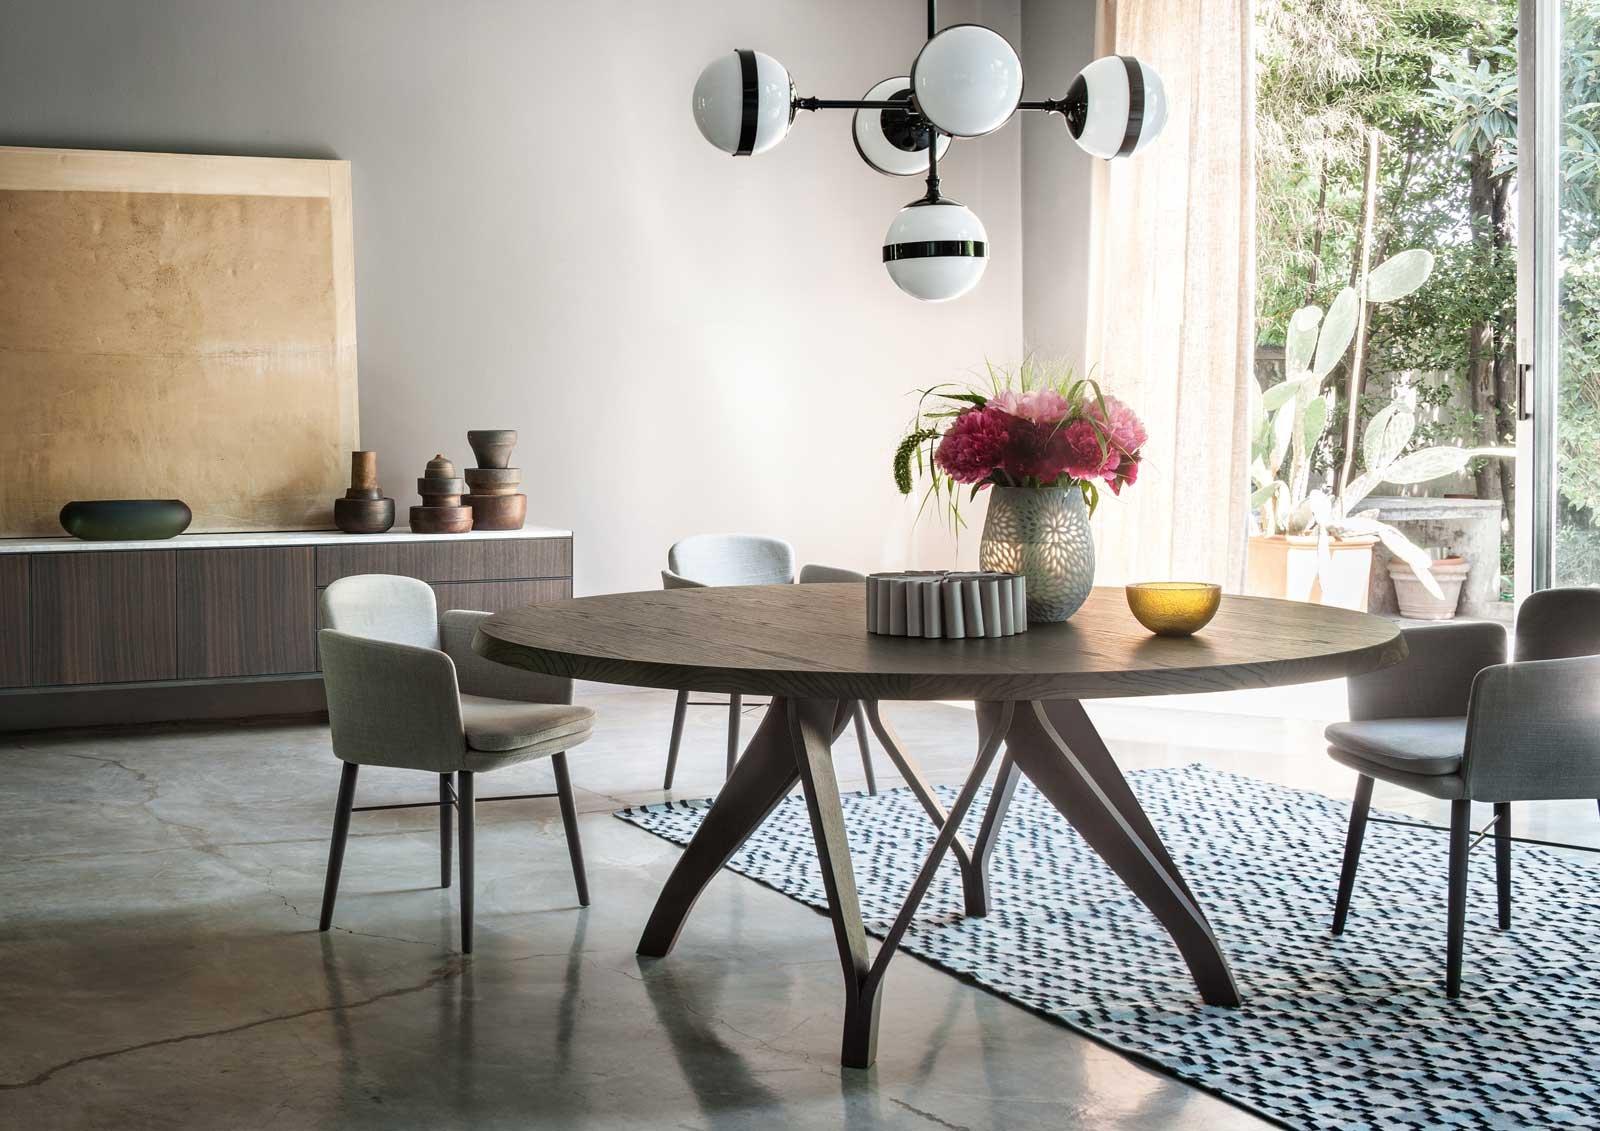 Design per la zona pranzo i tavoli lema rettangolari e for Tavoli pranzo